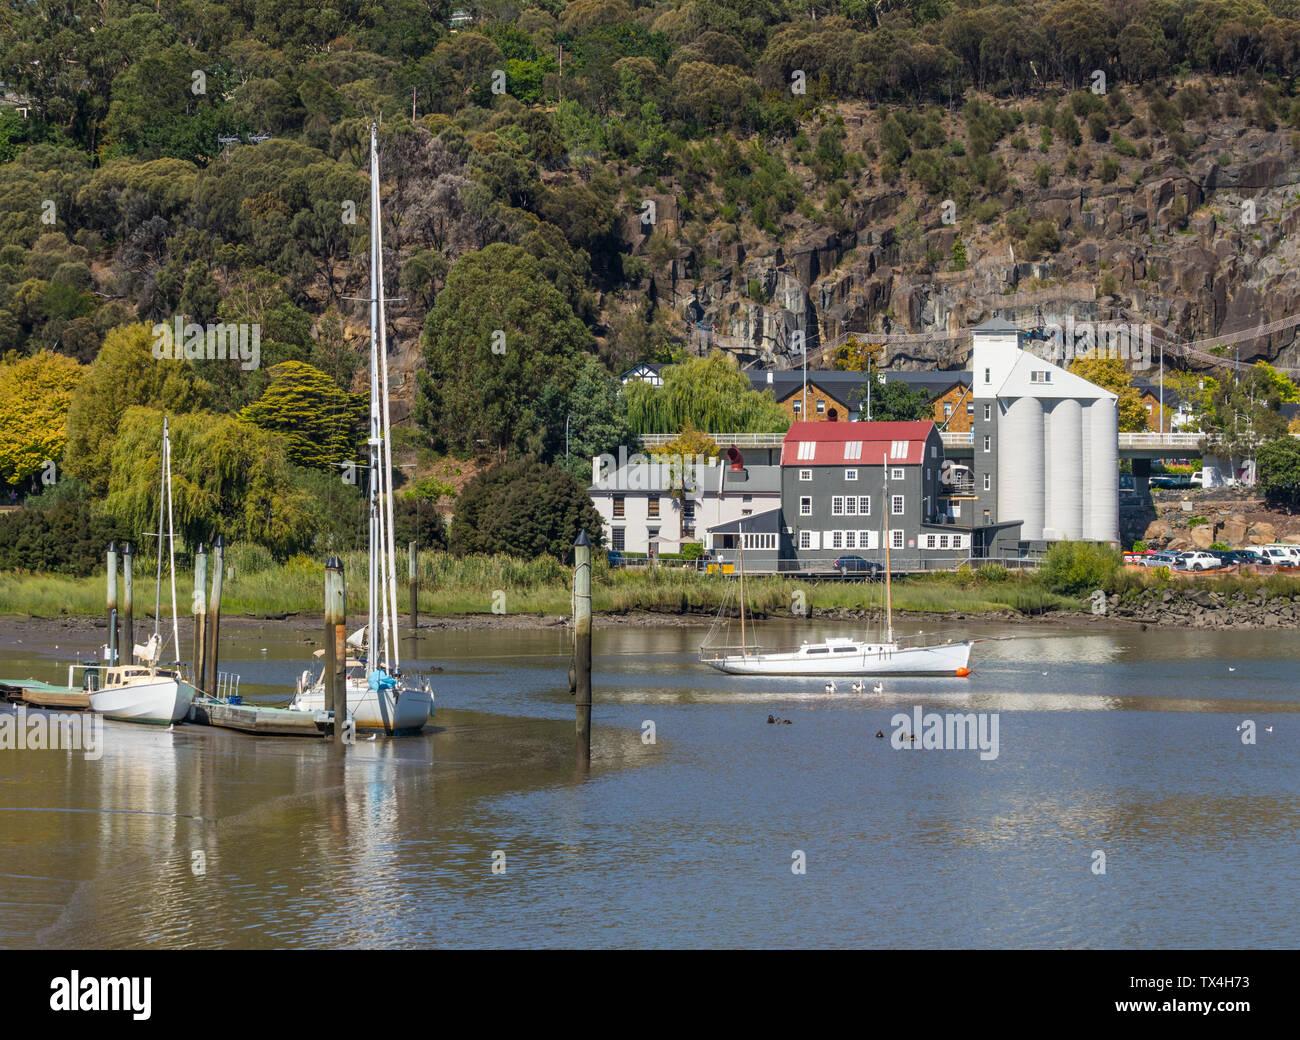 Yachts moored in the Tamar River in Launceston, in Tasmania, Australia. Stock Photo